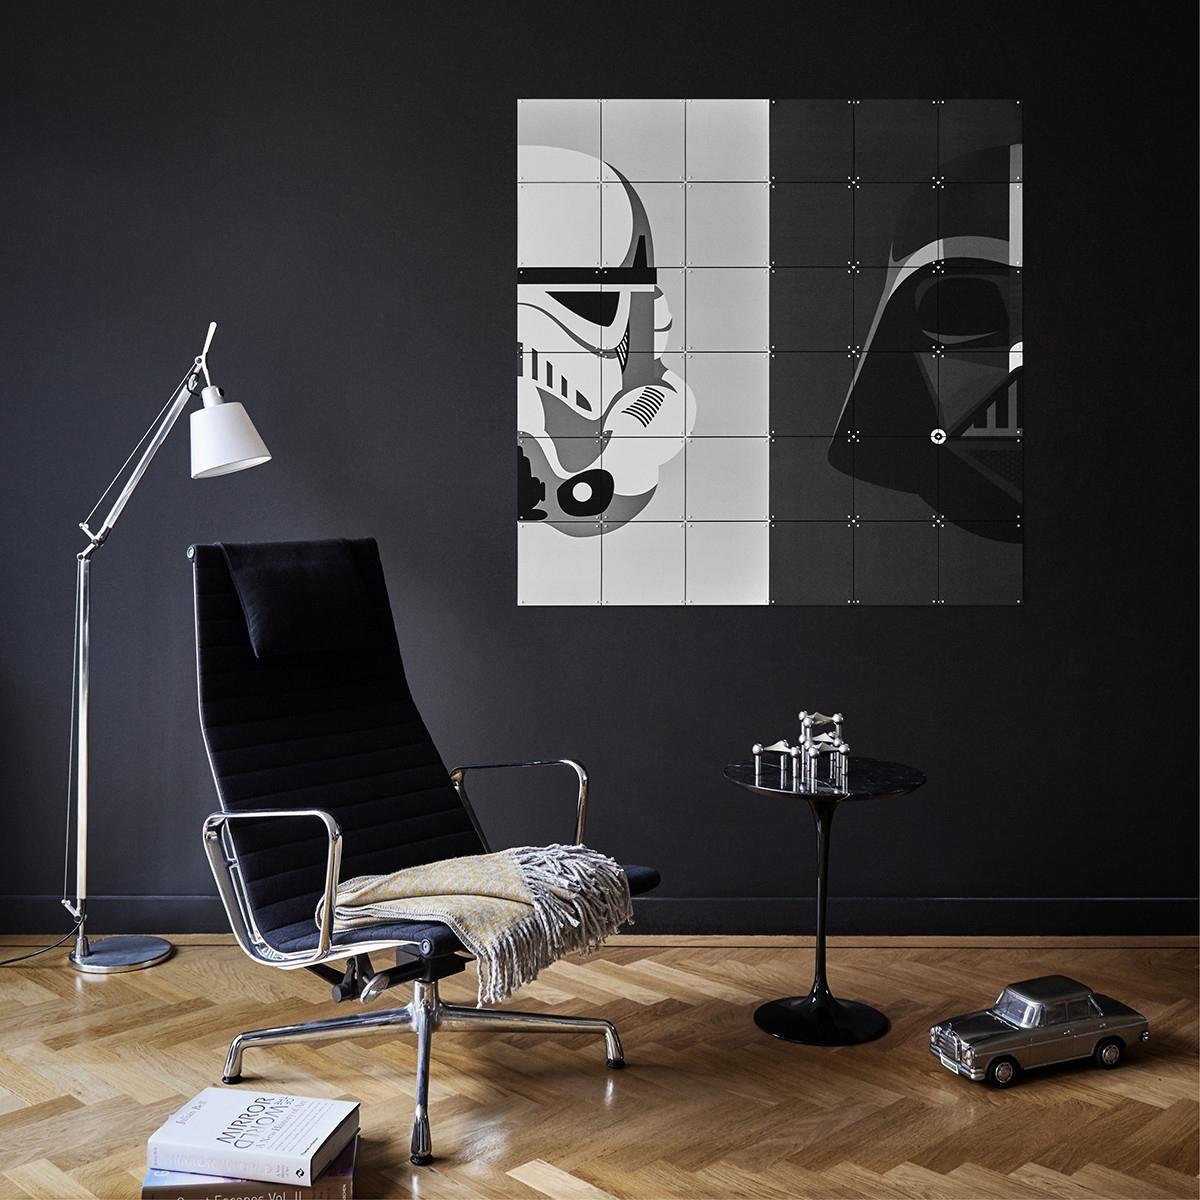 Star Wars Stormtrooper/darth Vader Wall Art Panels – Tgi Found It With Recent Star Wars Wall Art (View 14 of 15)